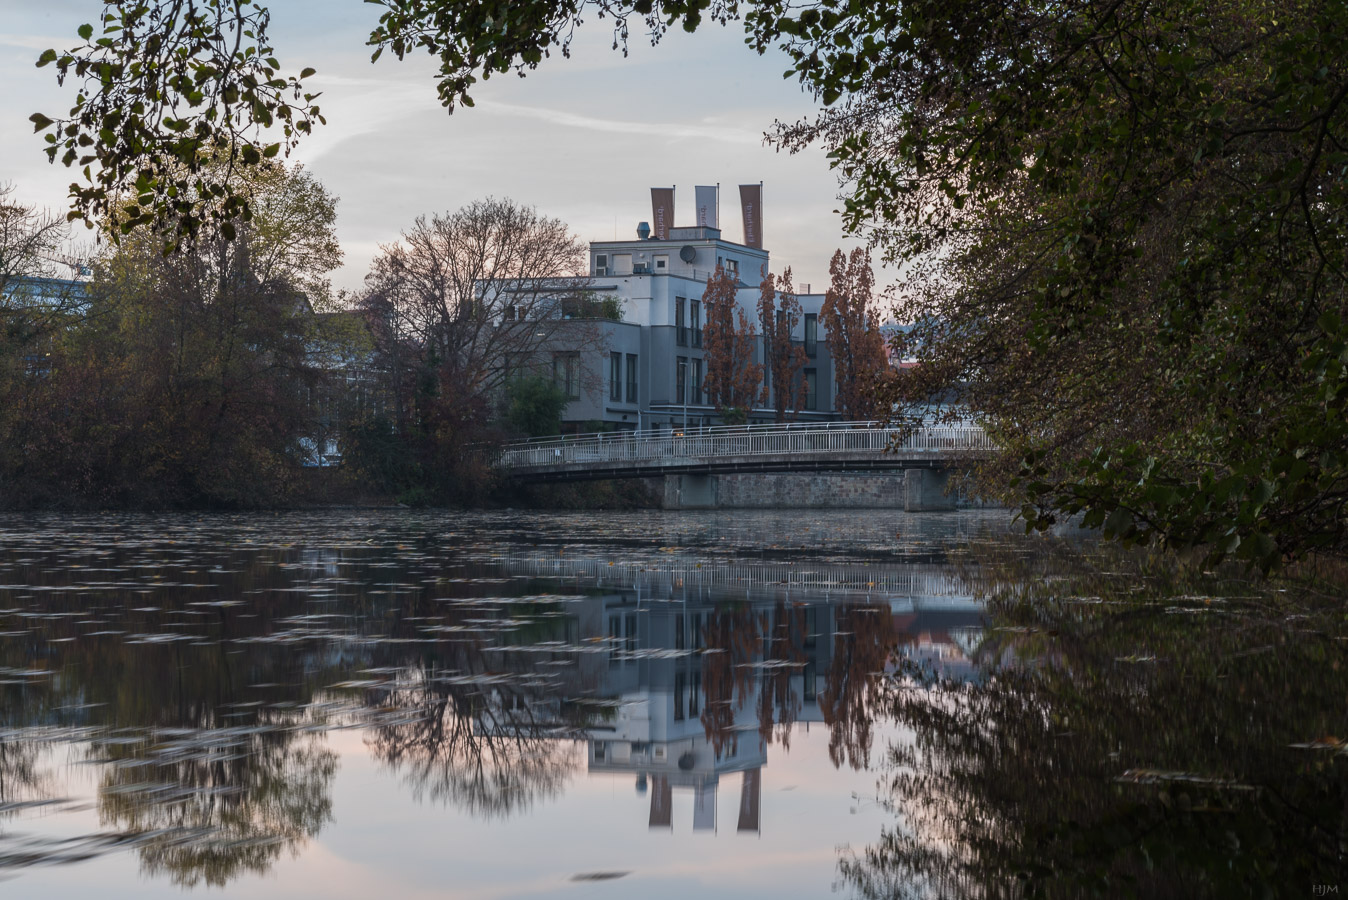 Hotel am Fluß